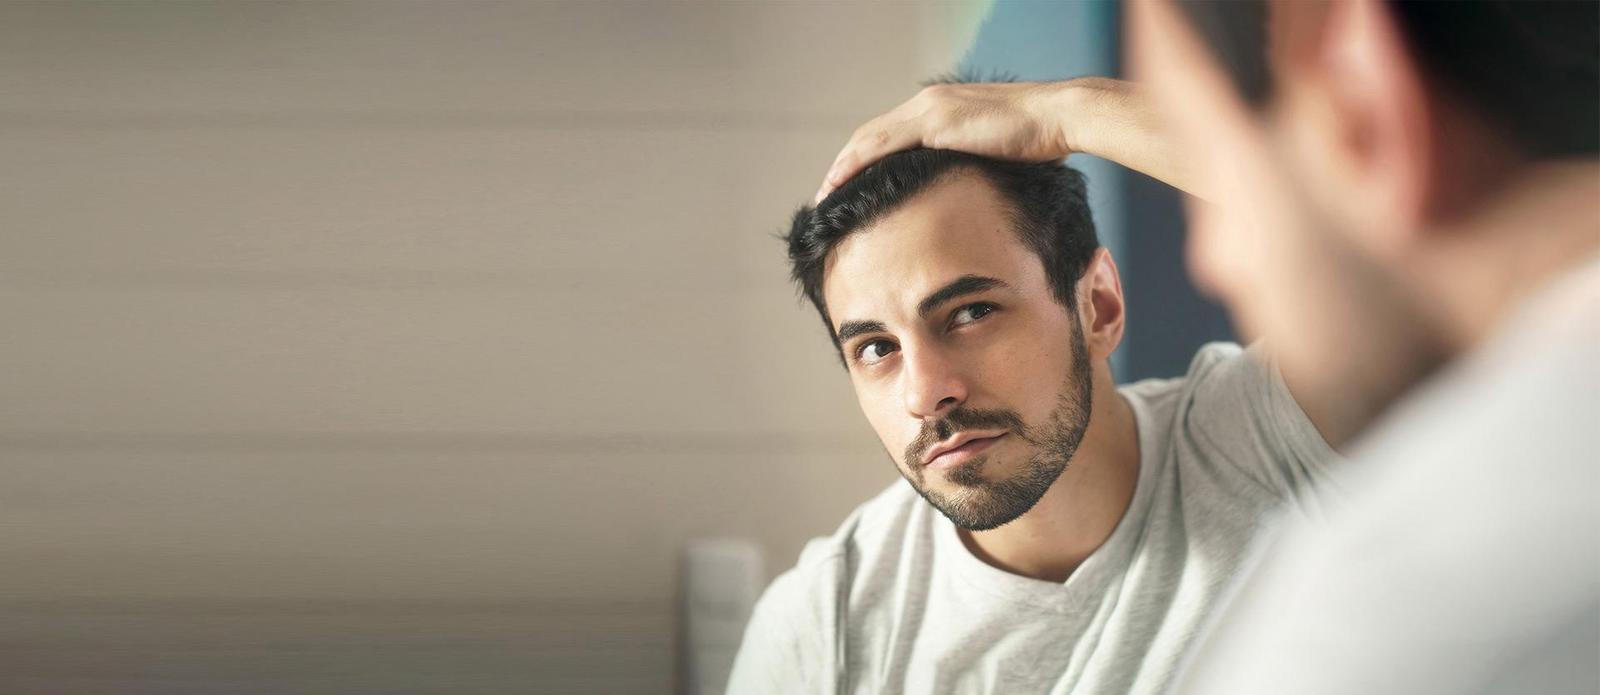 Hair Growth Factor